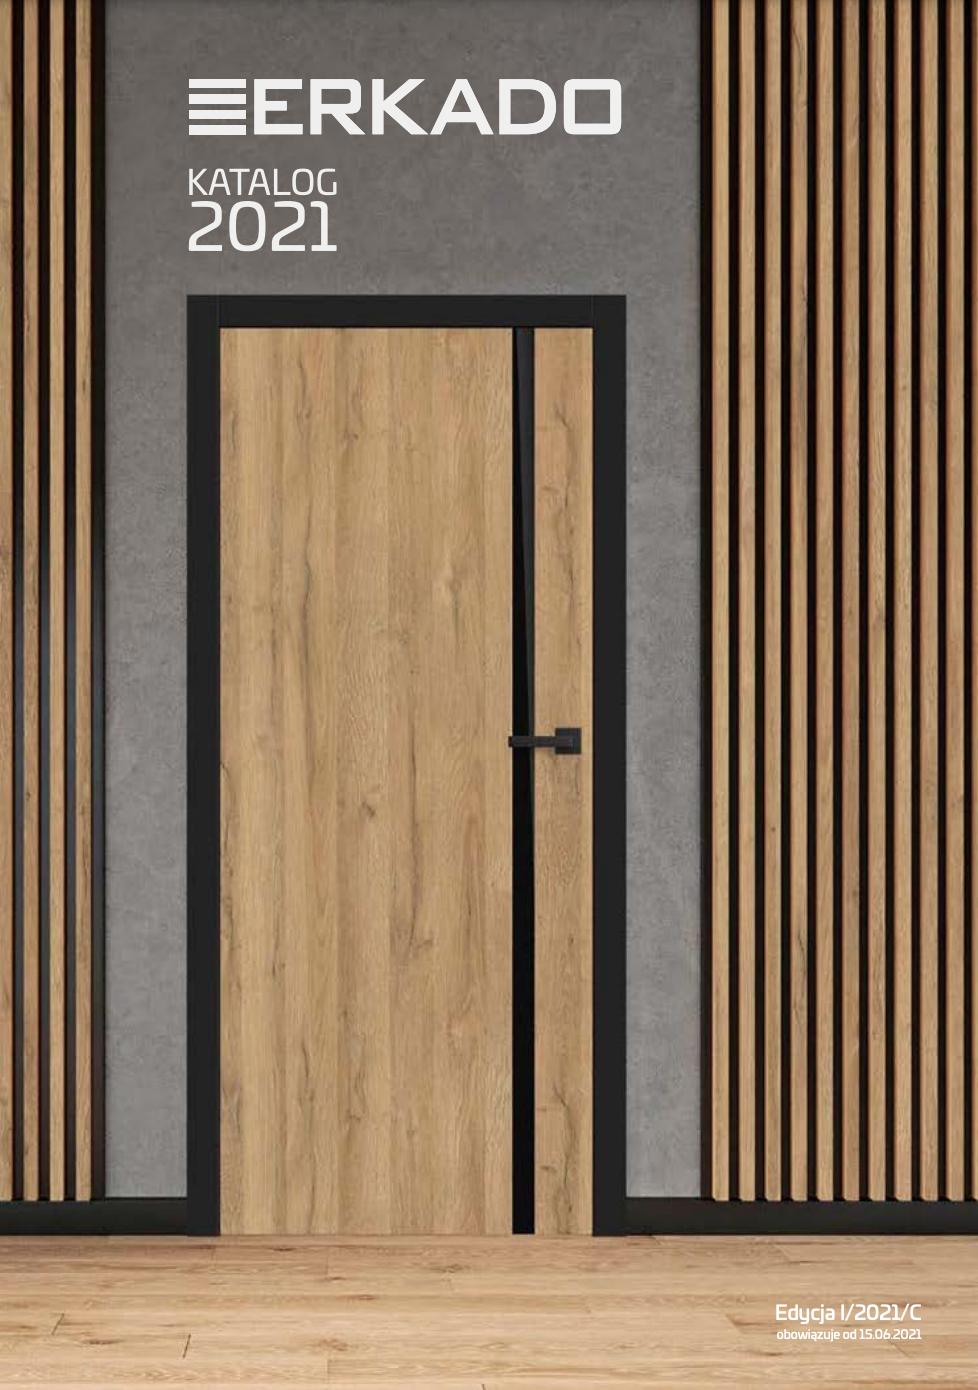 katalog erkado 2021